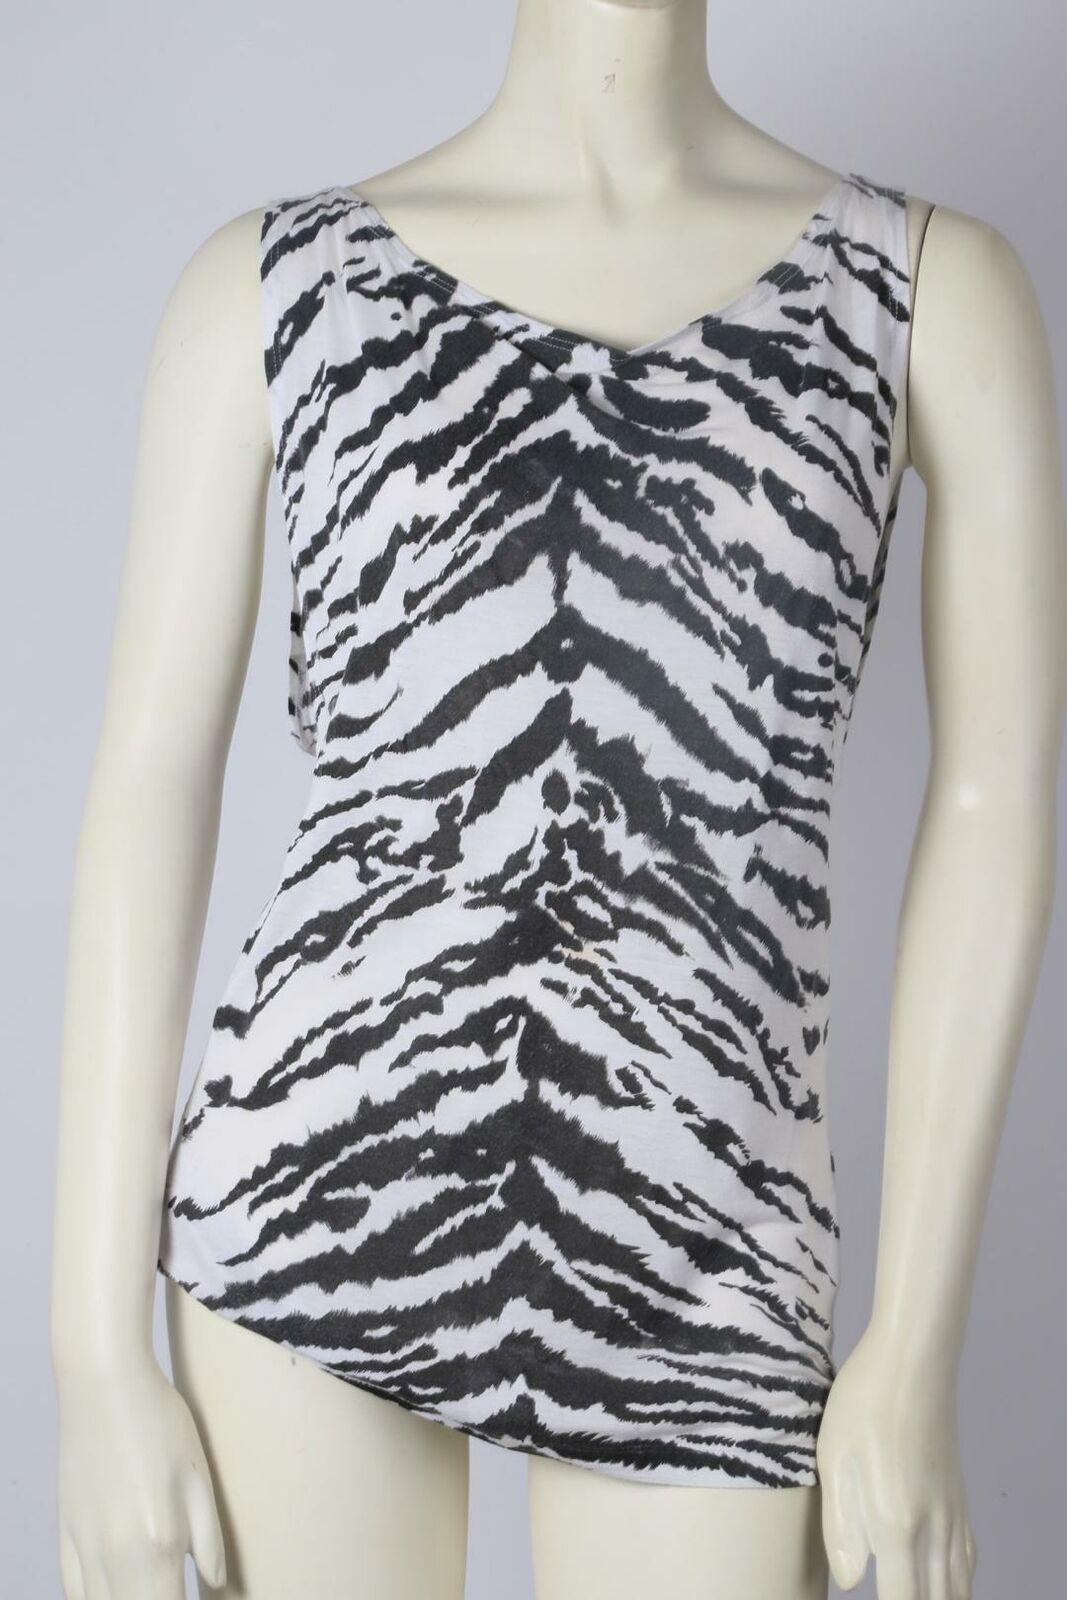 SAINT LAURENT Zebra Print Sleeveless Top Size S - image 2